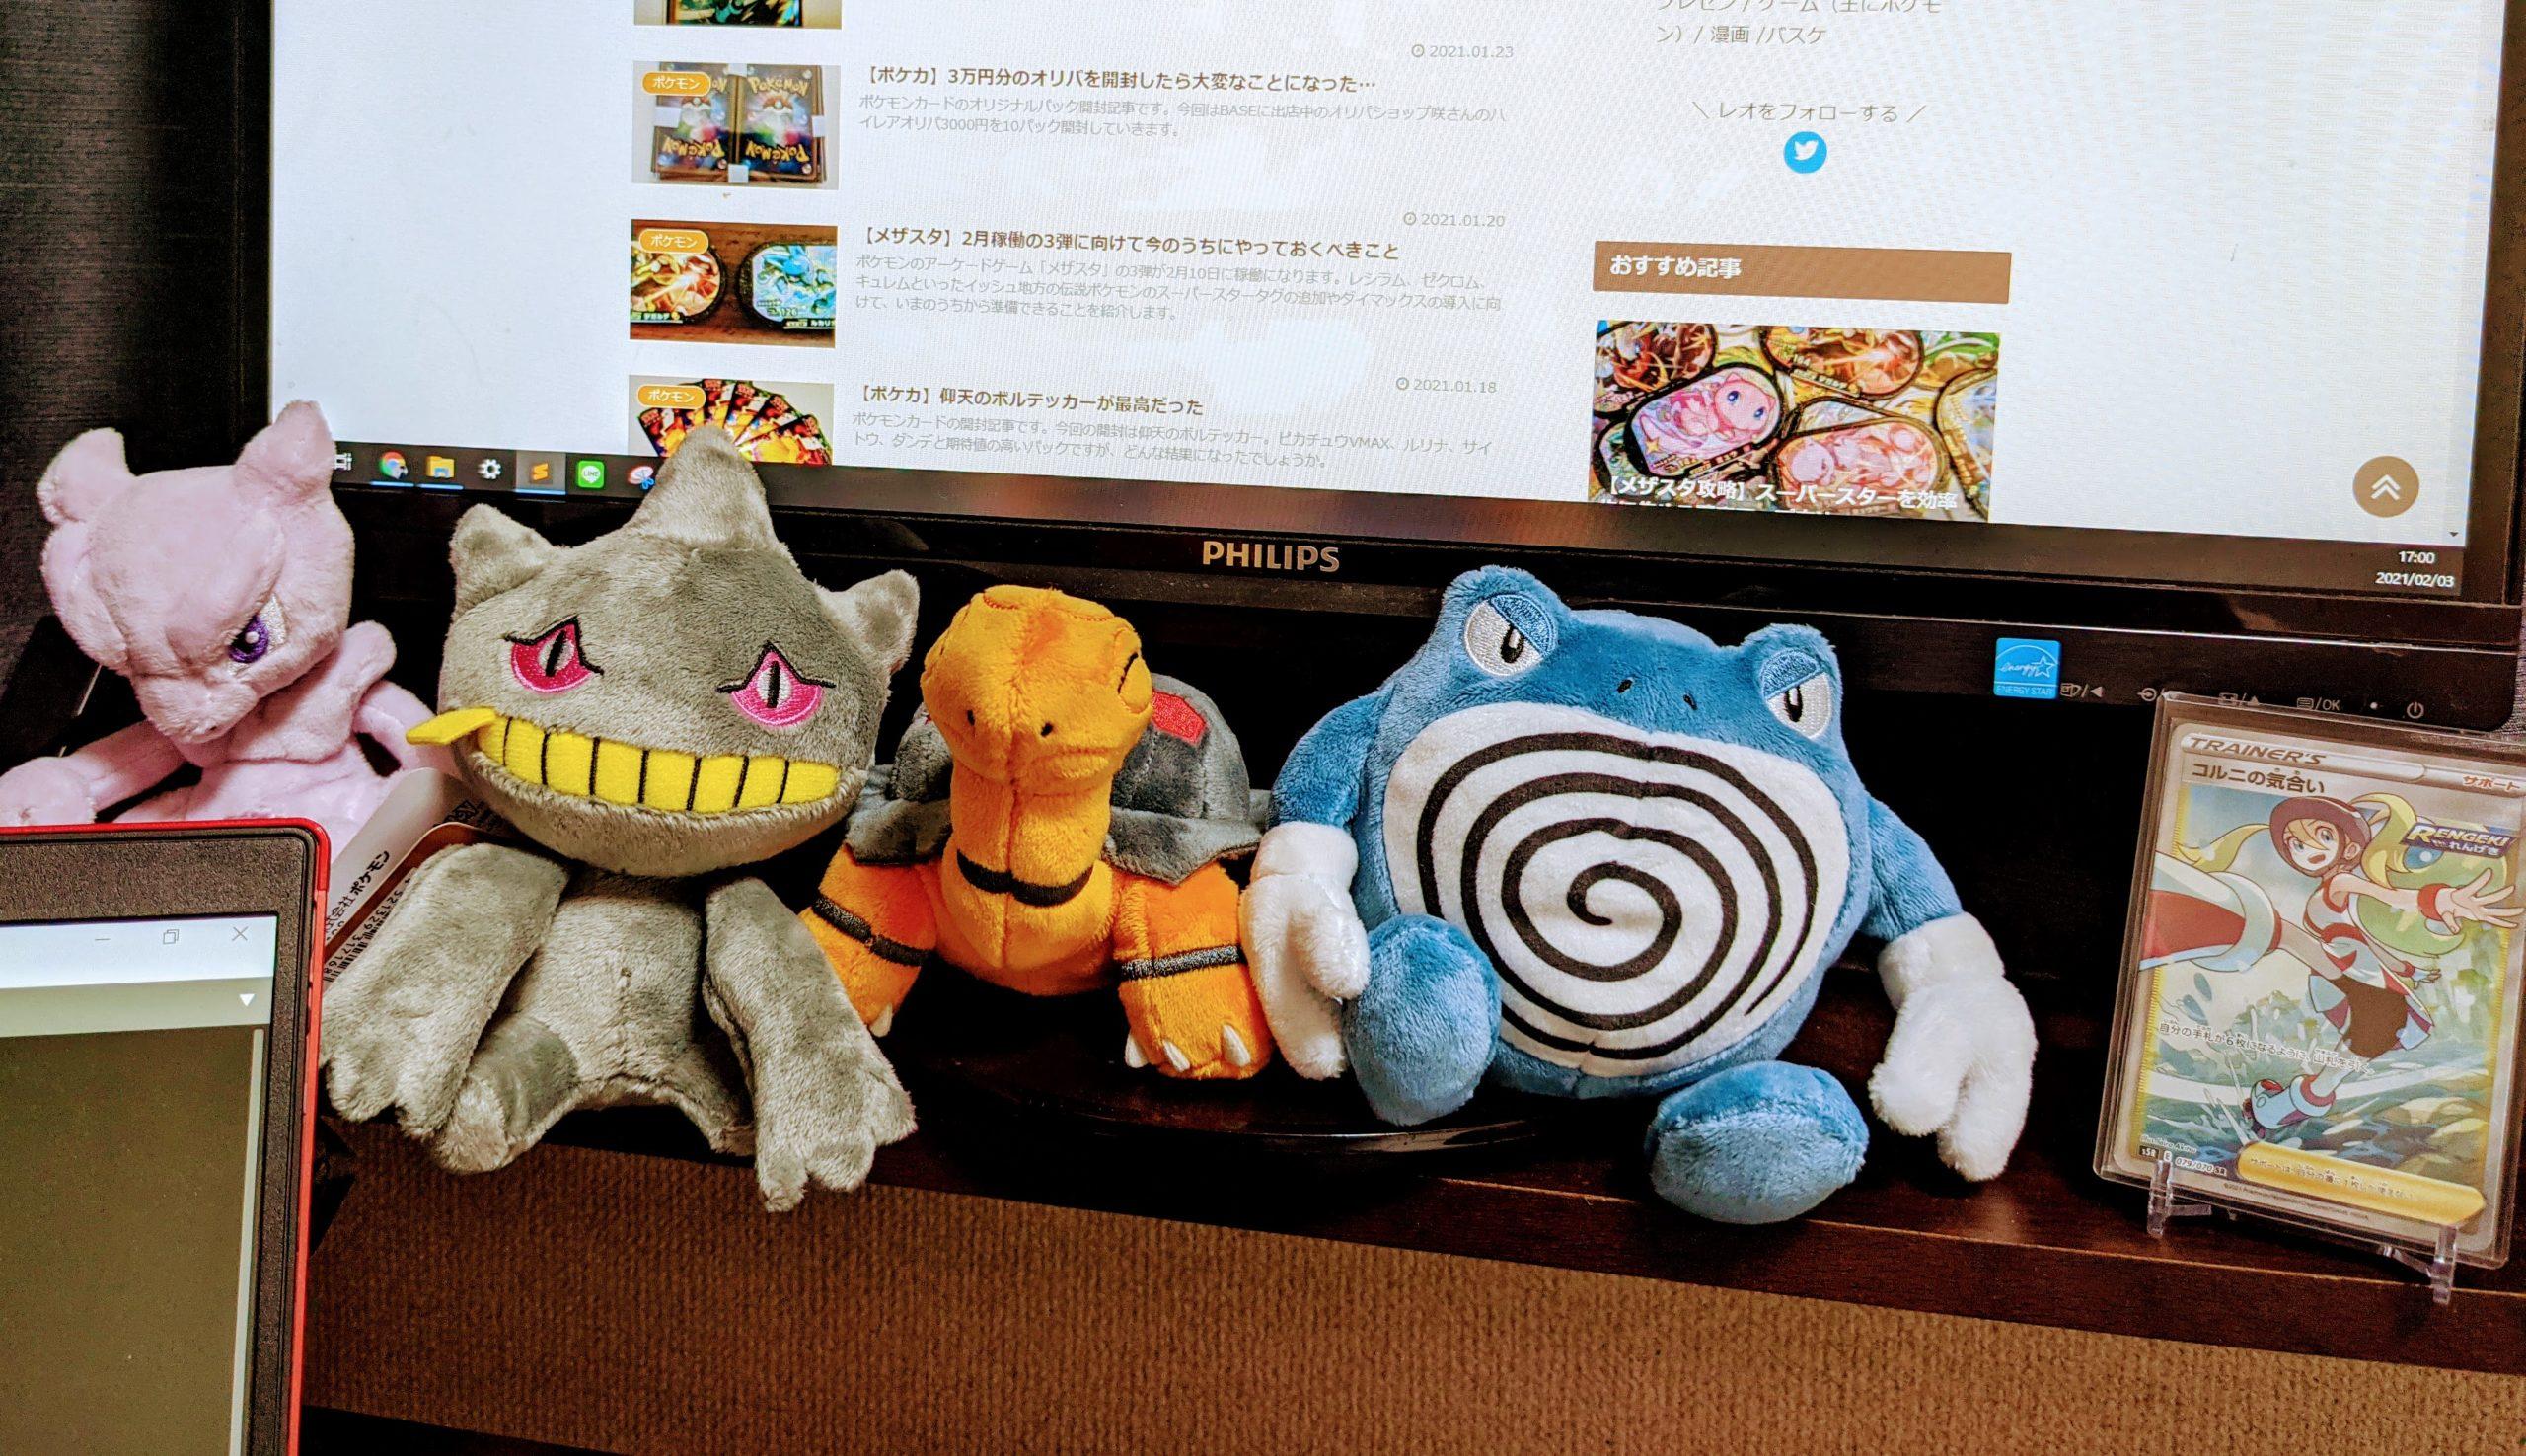 Pokémon fitのあるデスク